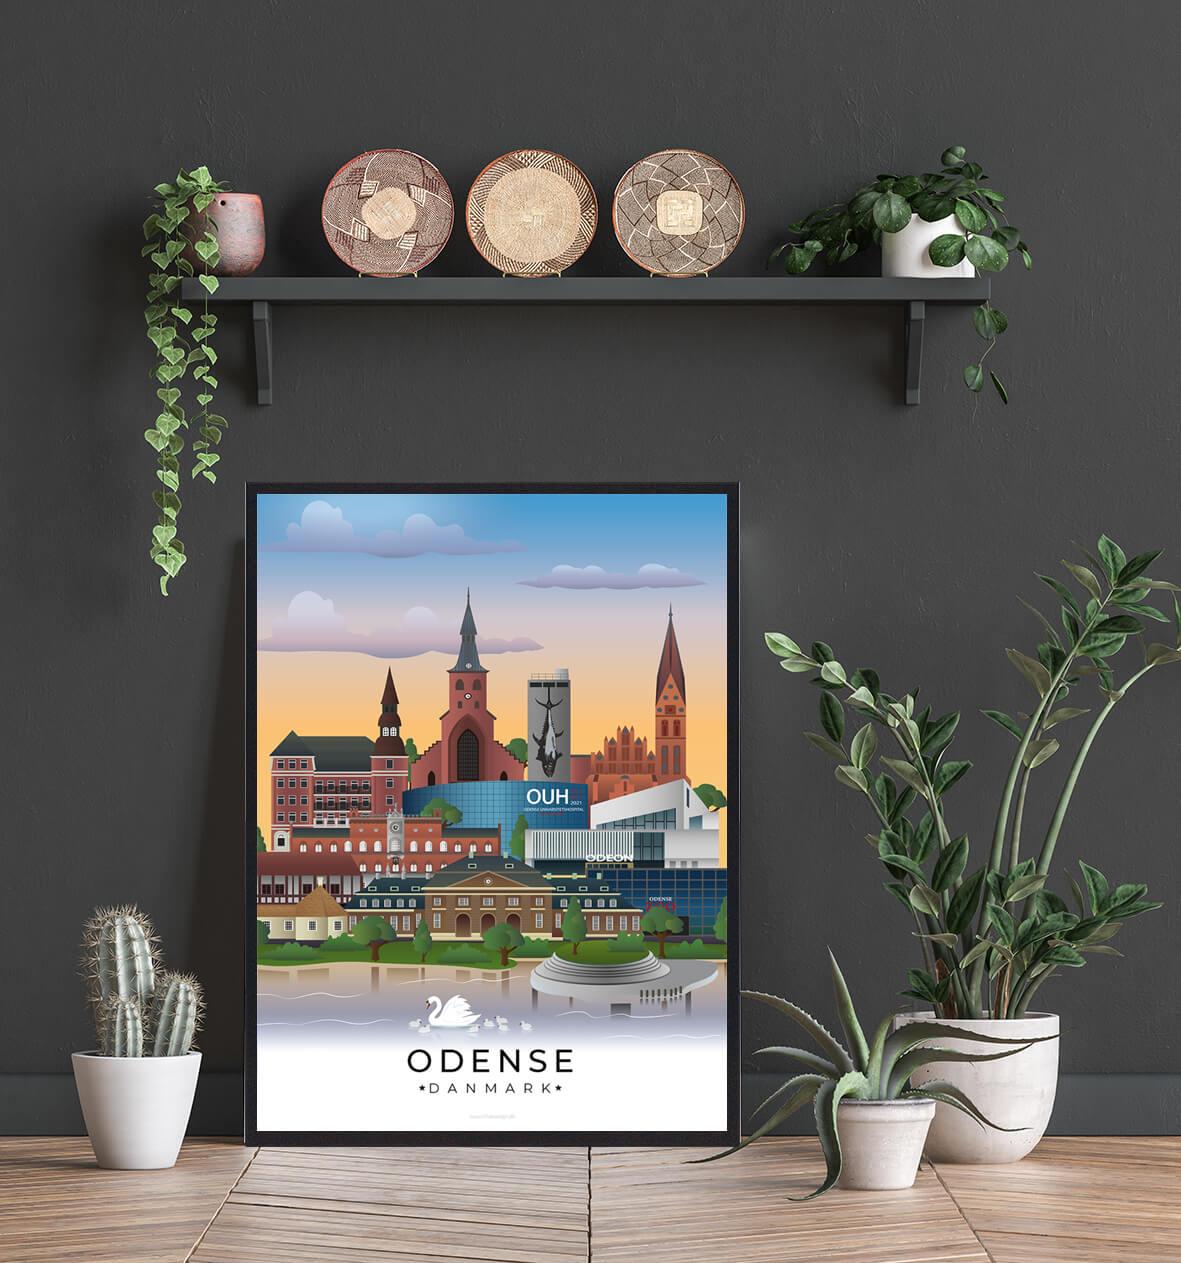 Odense-plakat-boligen-1